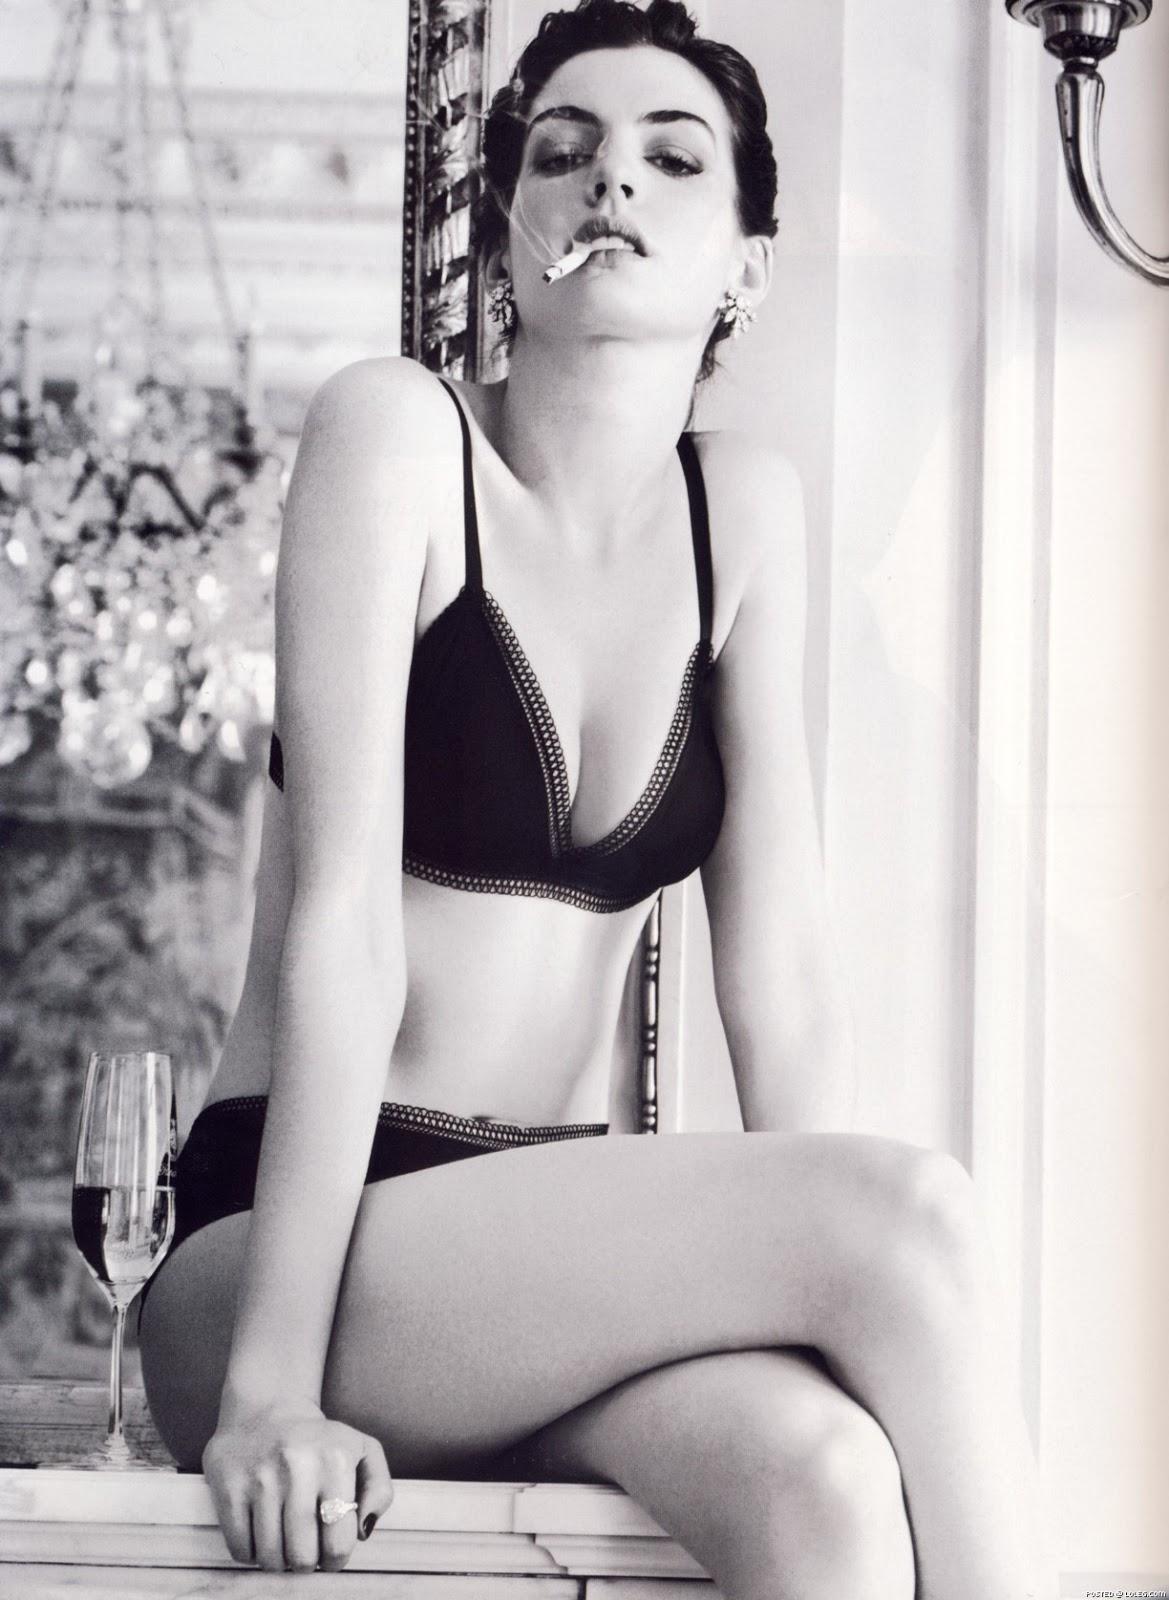 Anna hathaway sexy pic